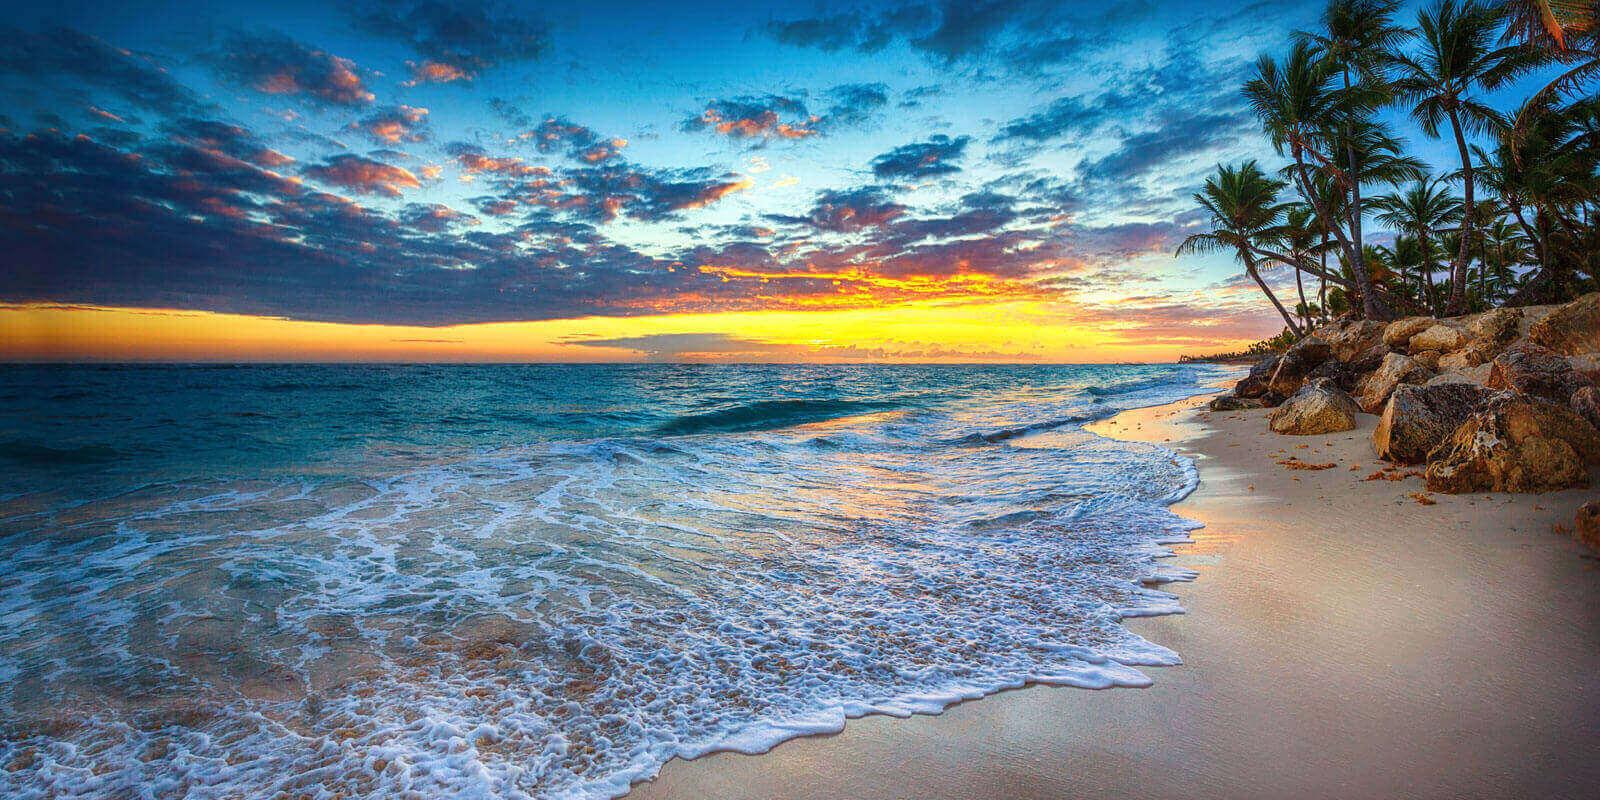 Sunrise in bahamas Beachside